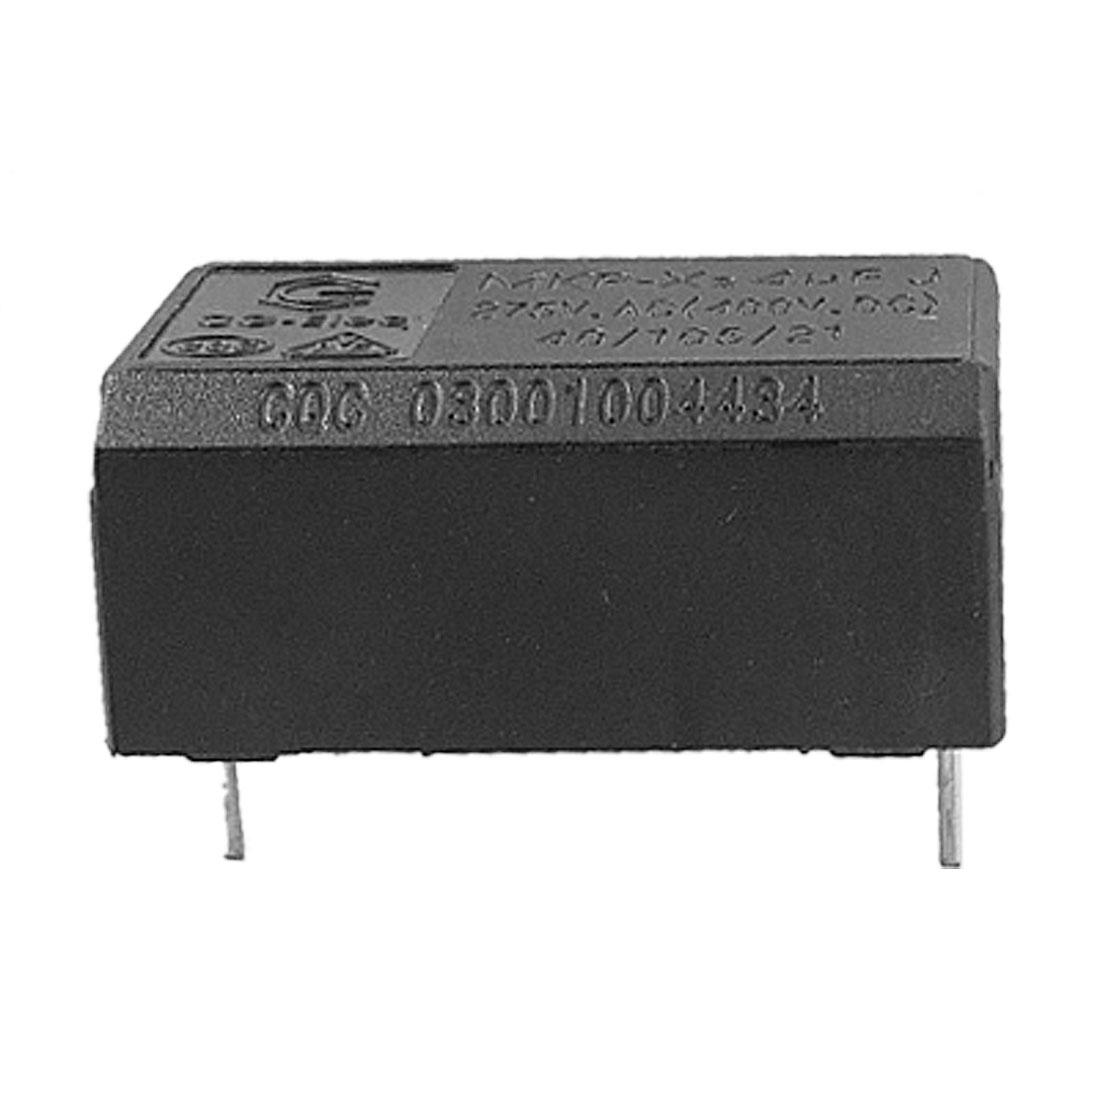 275VAC 4uF Polypropylene Film Induction Cooker Capacitor